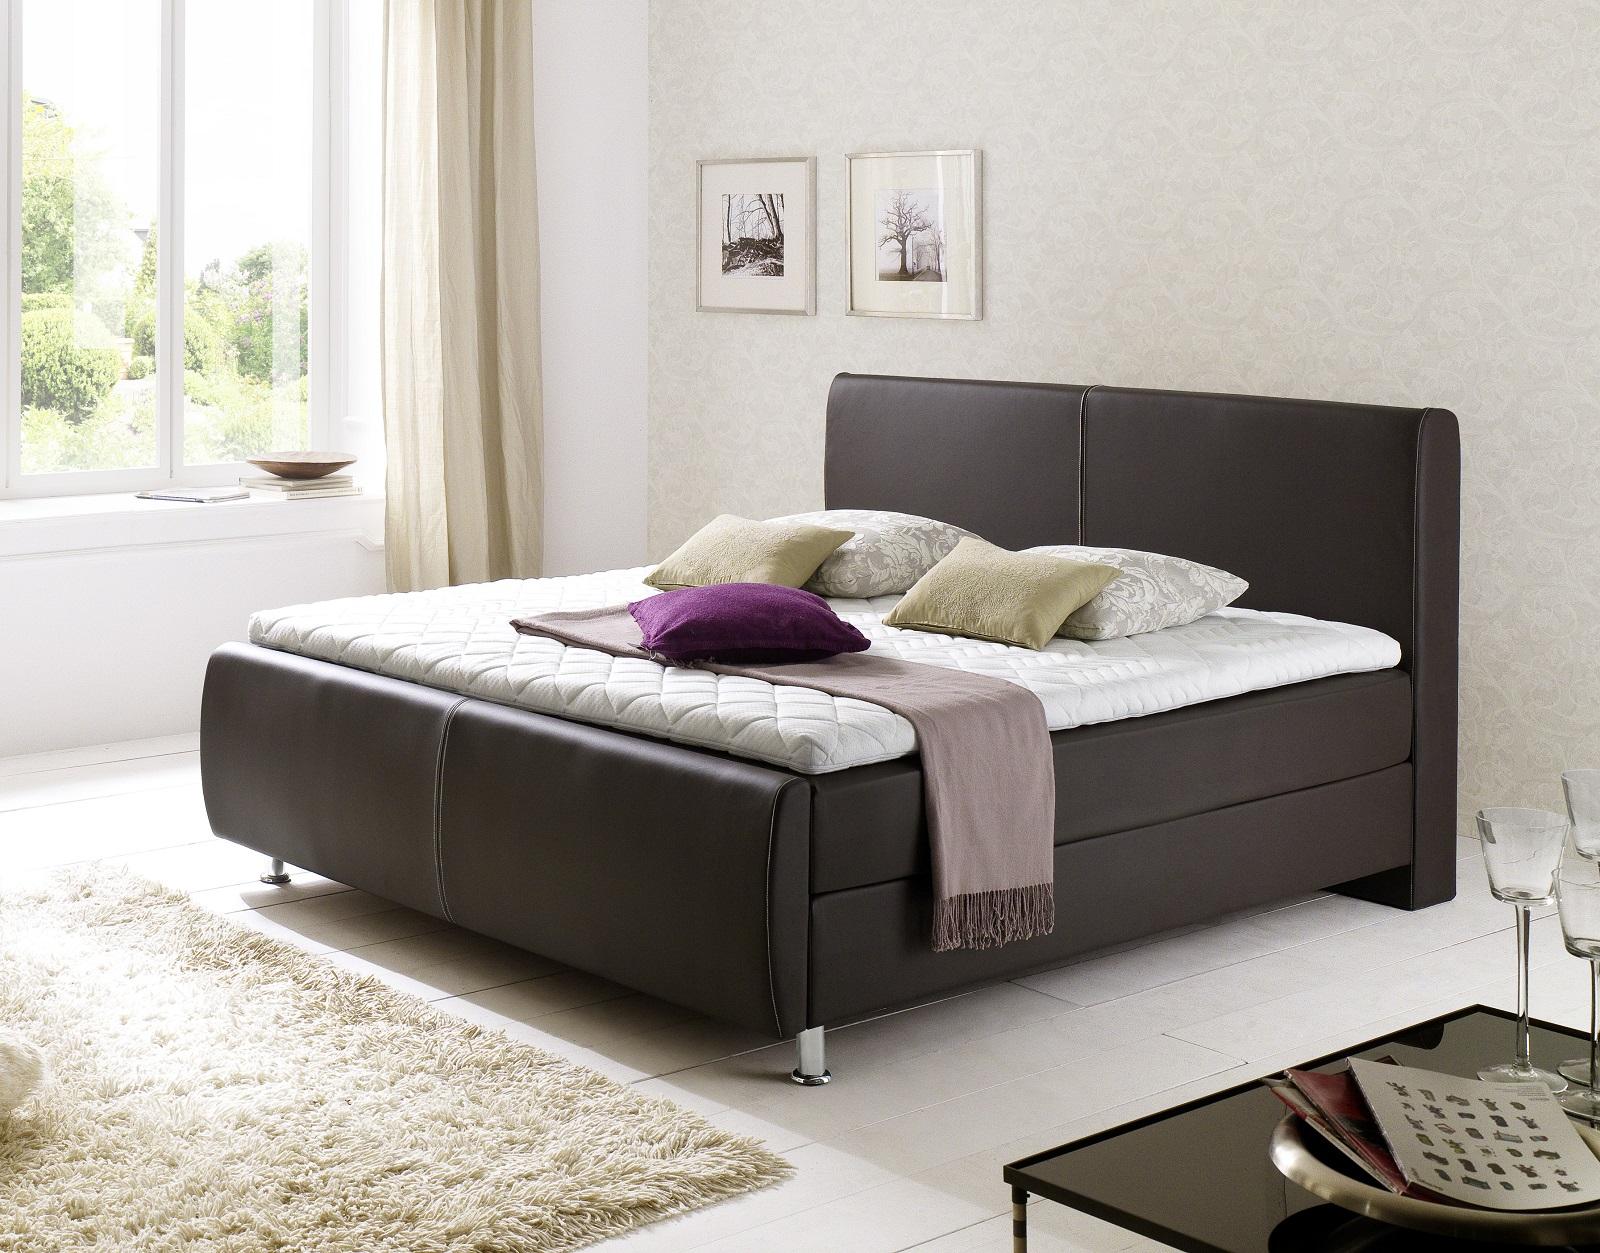 boxspringbett amondo braun 140cm x 200cm. Black Bedroom Furniture Sets. Home Design Ideas